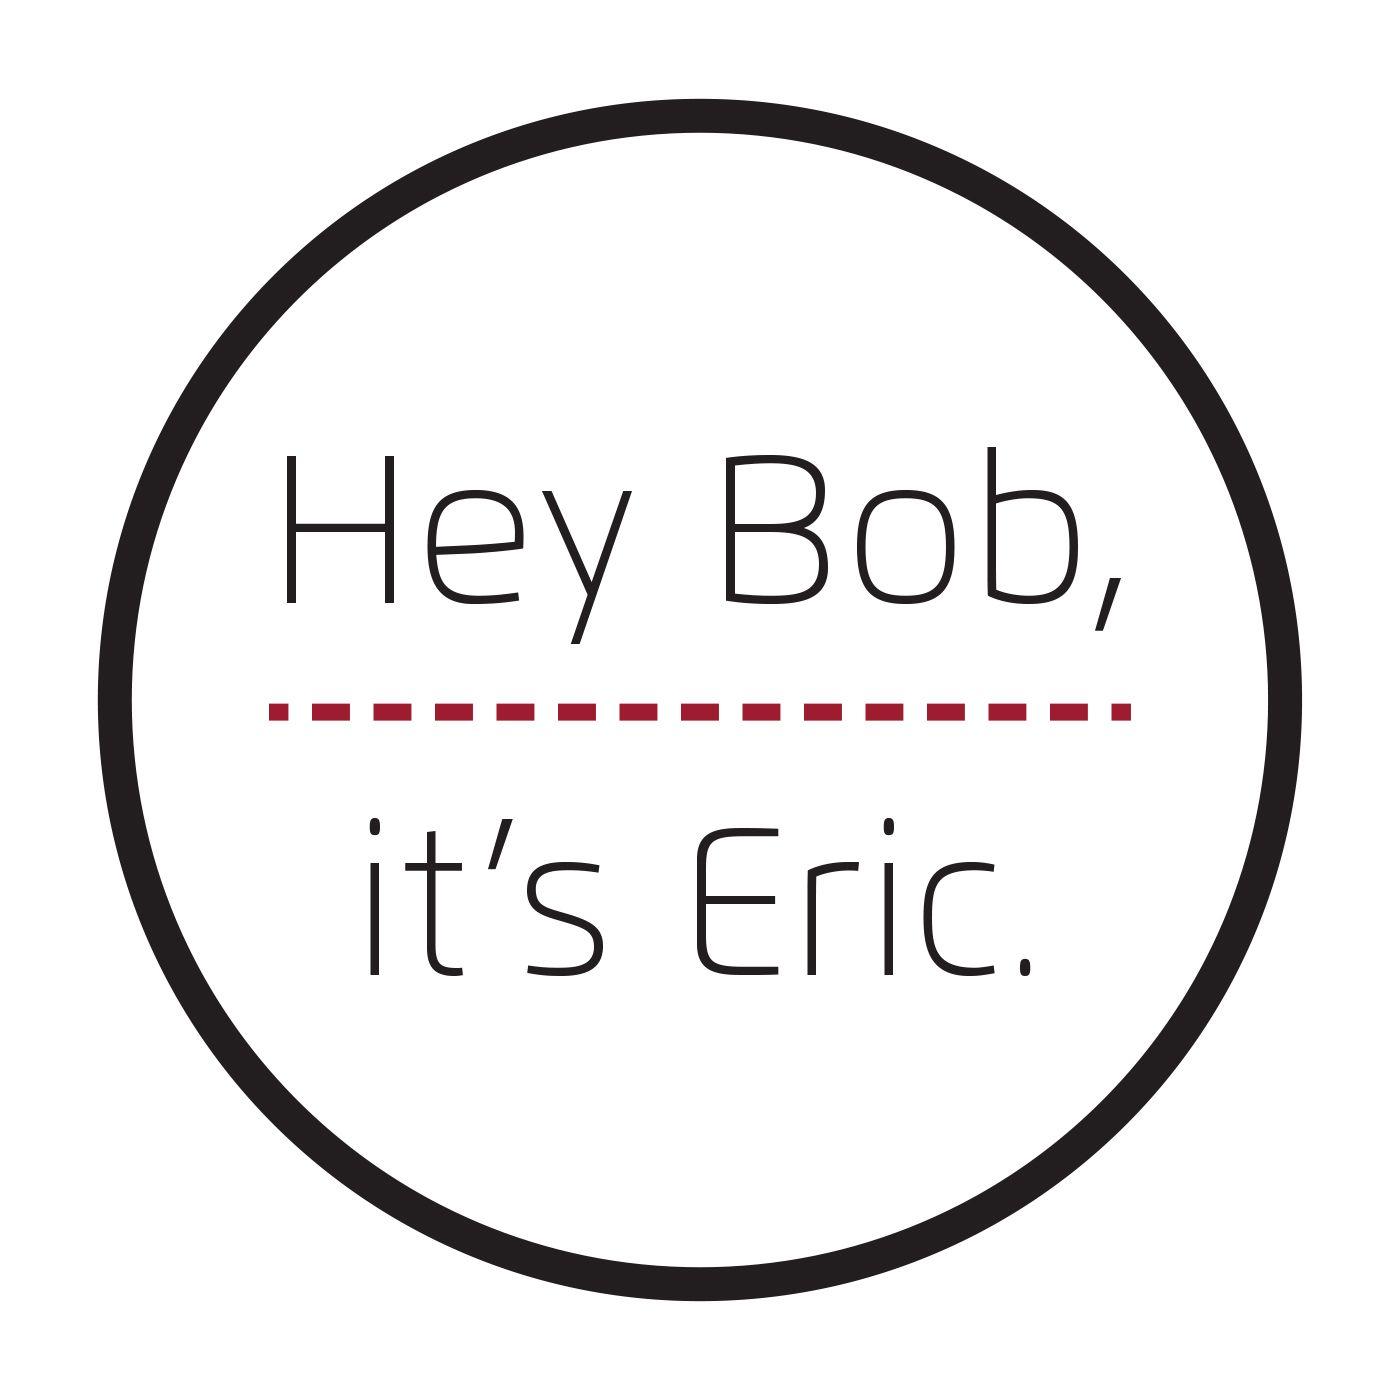 Hey Bob, it's Eric.